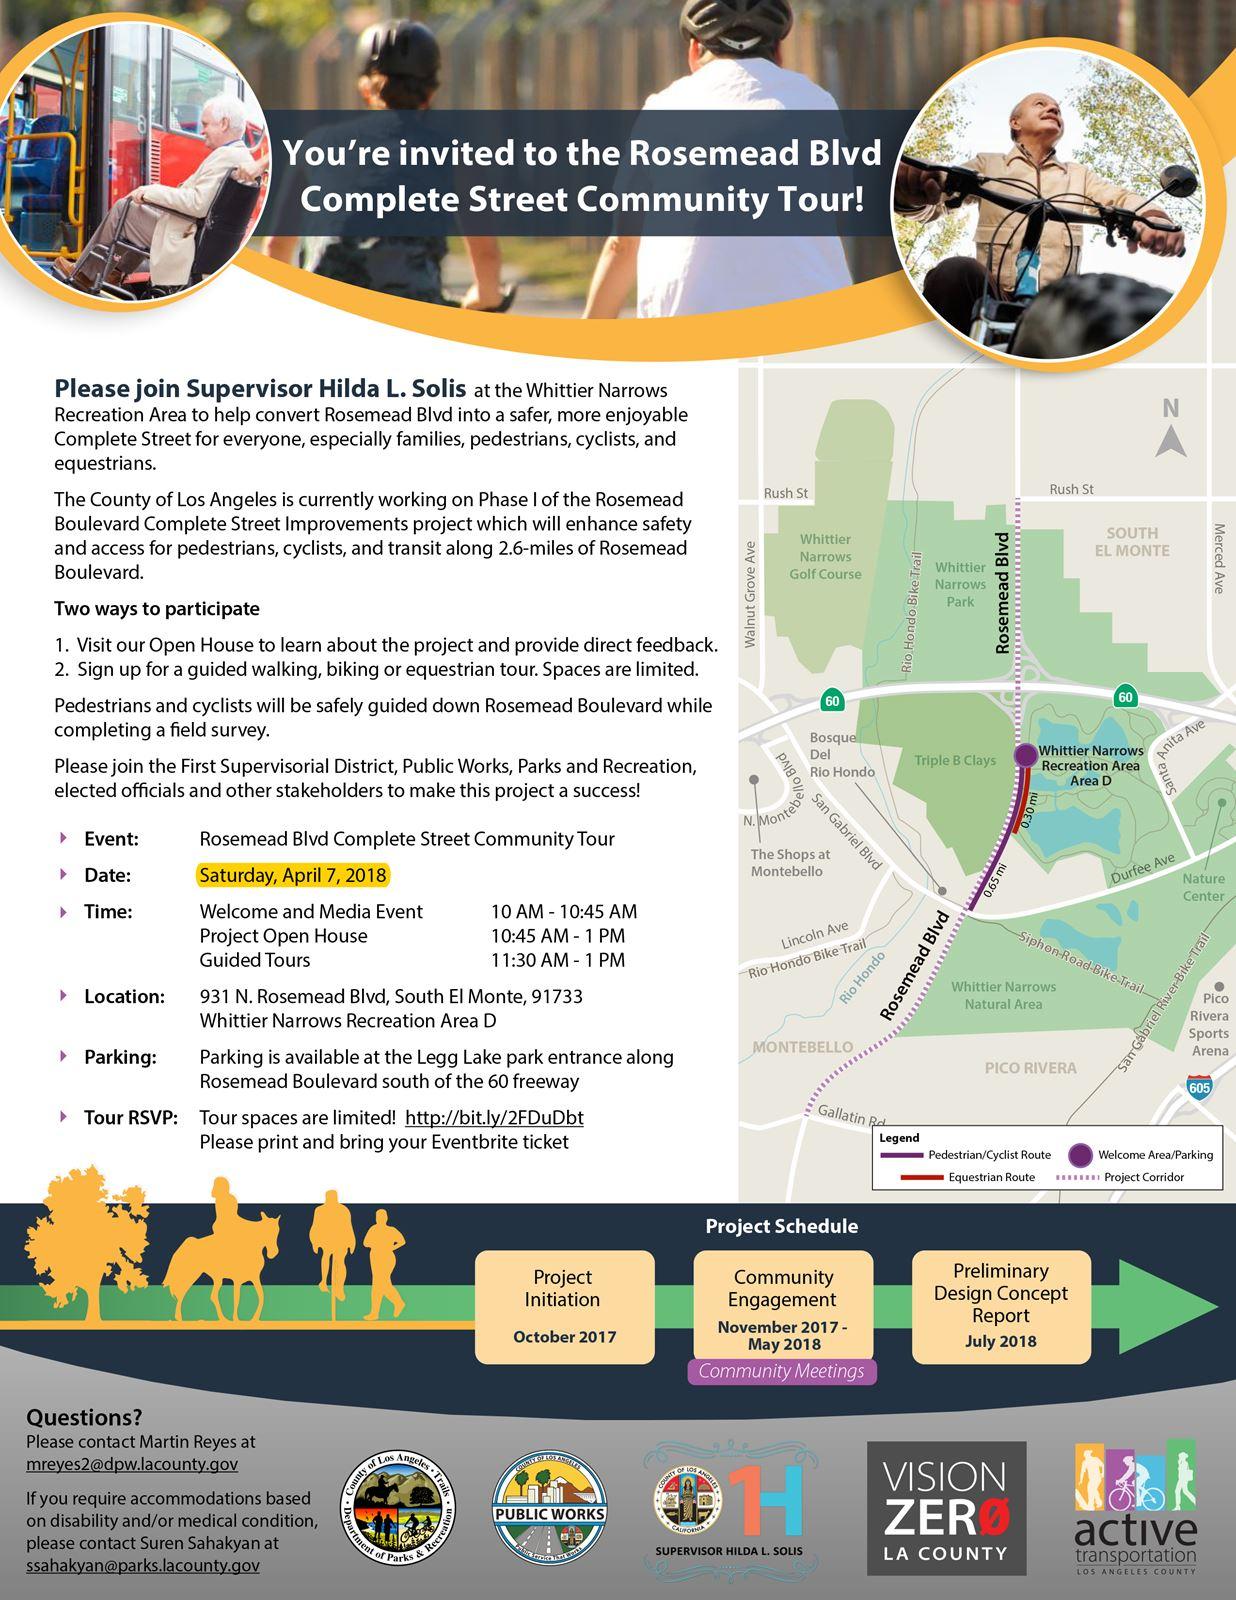 Rosemead Complete Street Community Tour